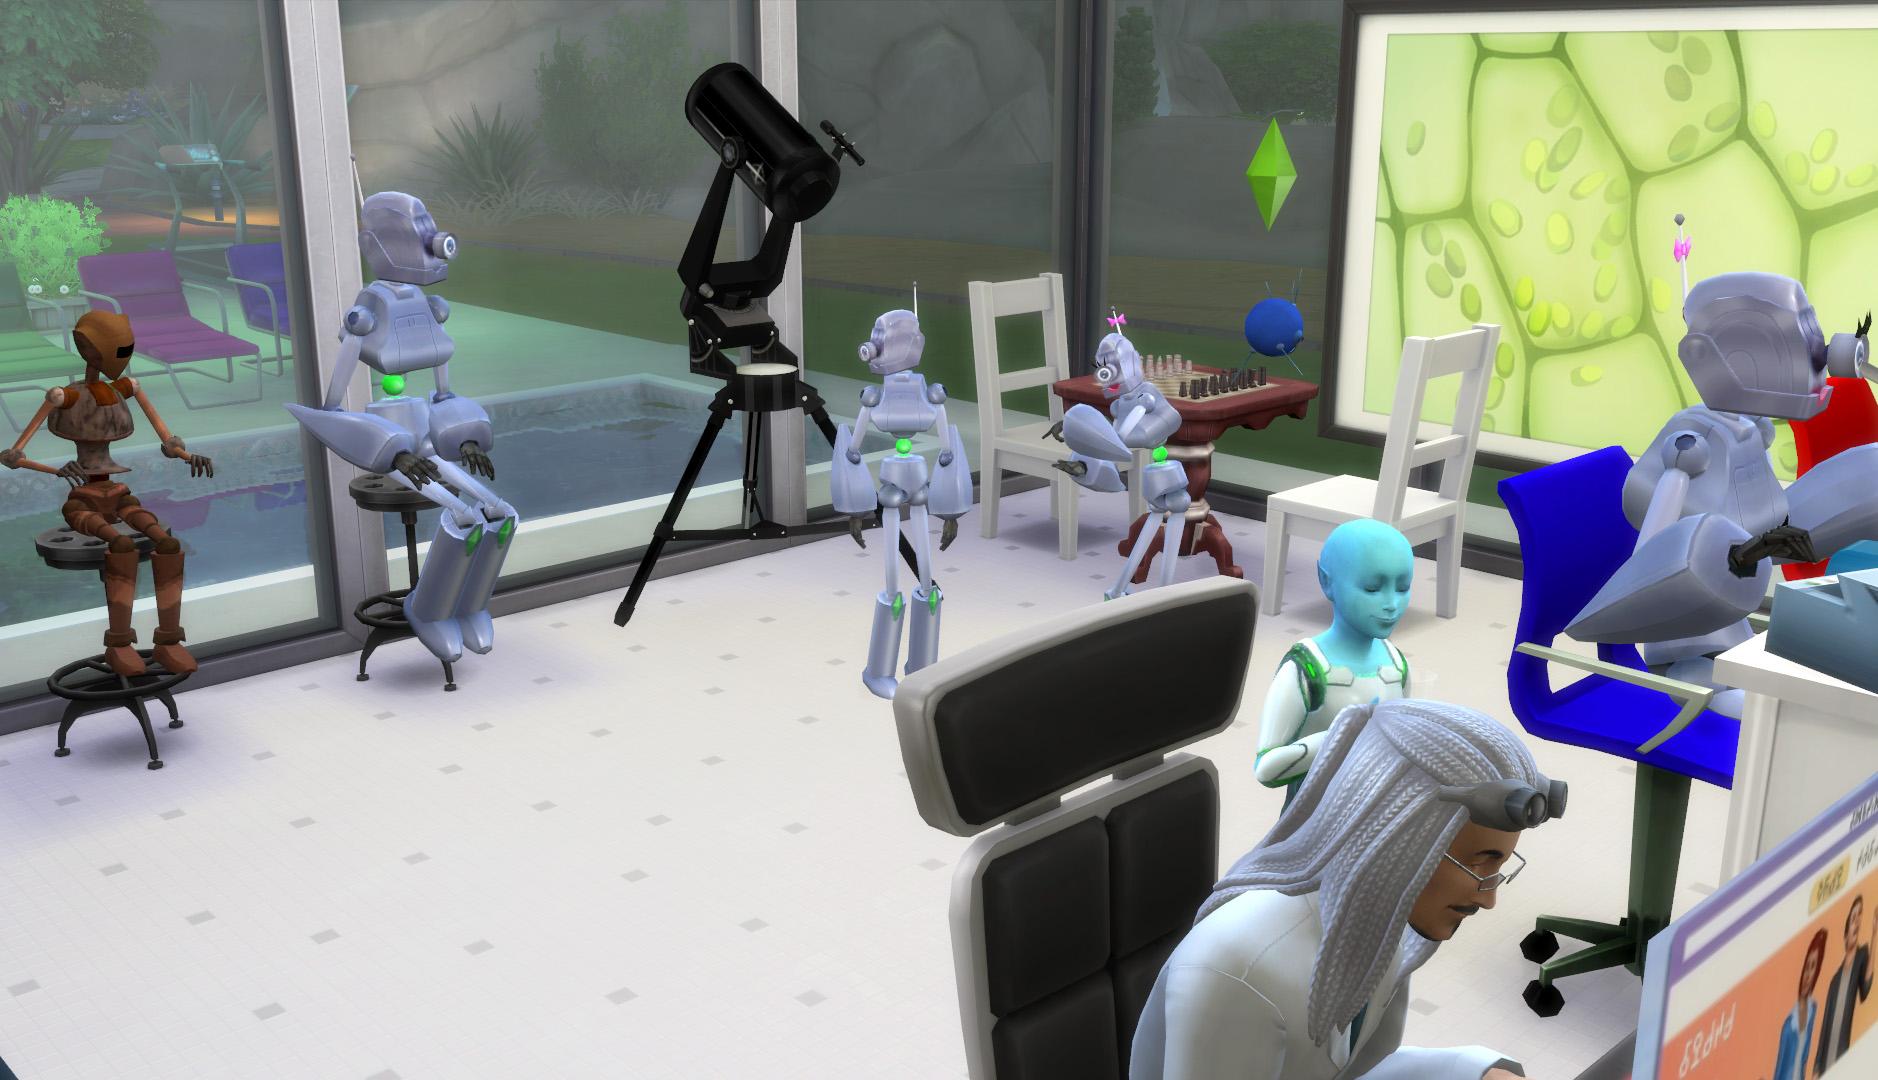 Mod The Sims - Tiny Robots - Kids Robot Costumes